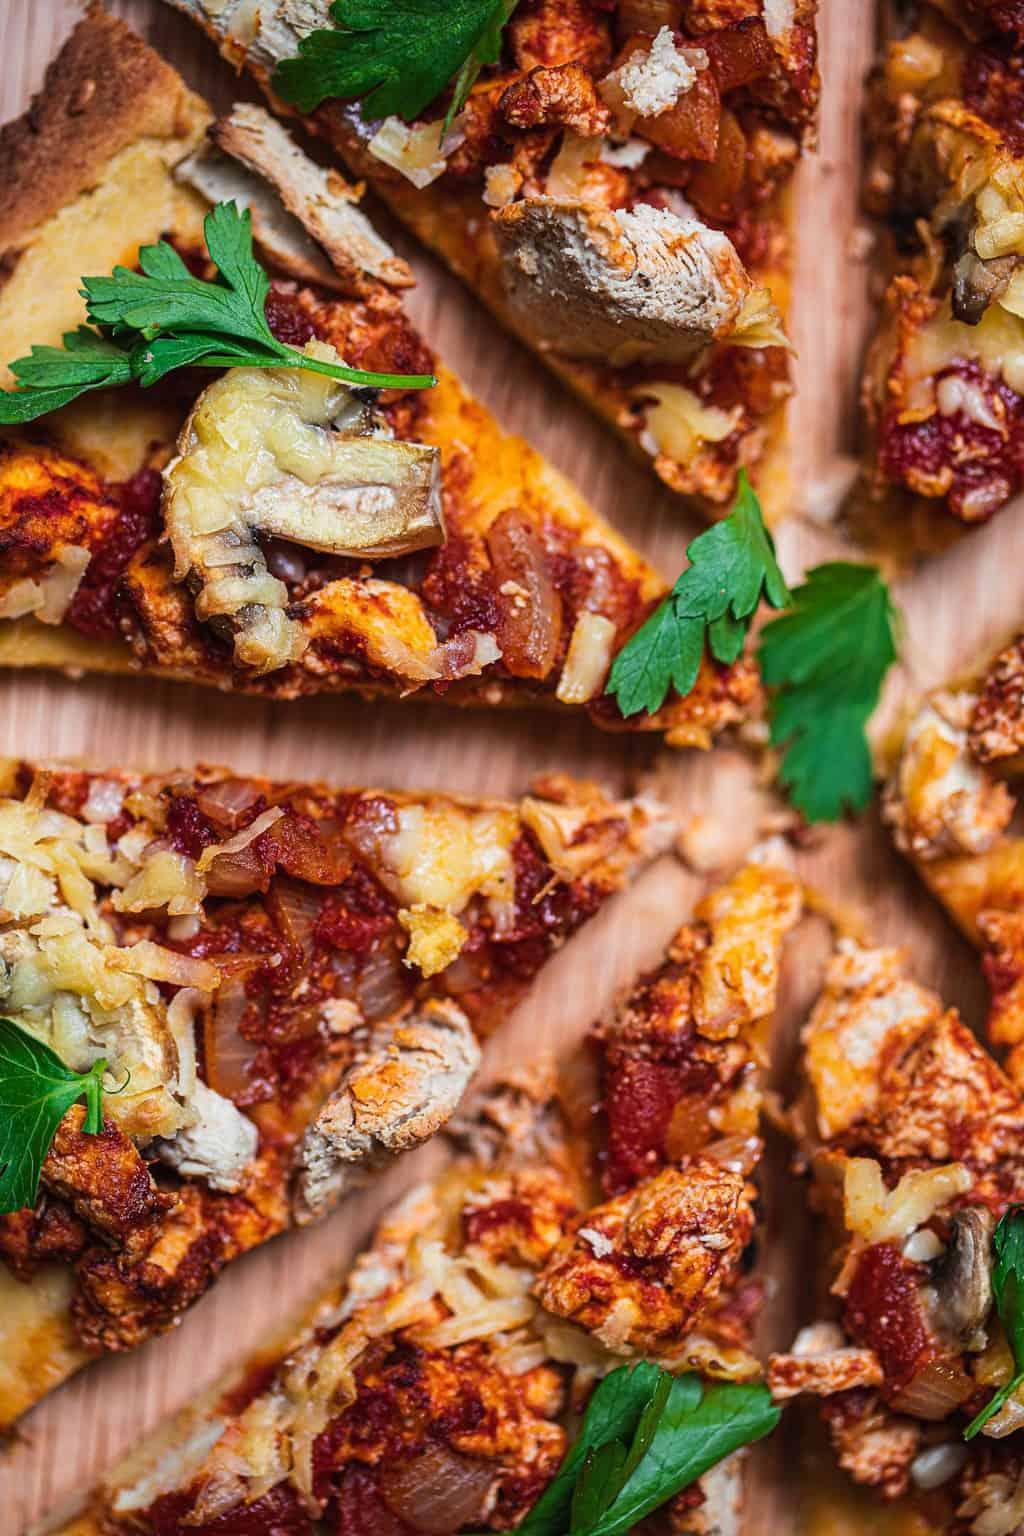 Closeup of vegan pizza with mushrooms